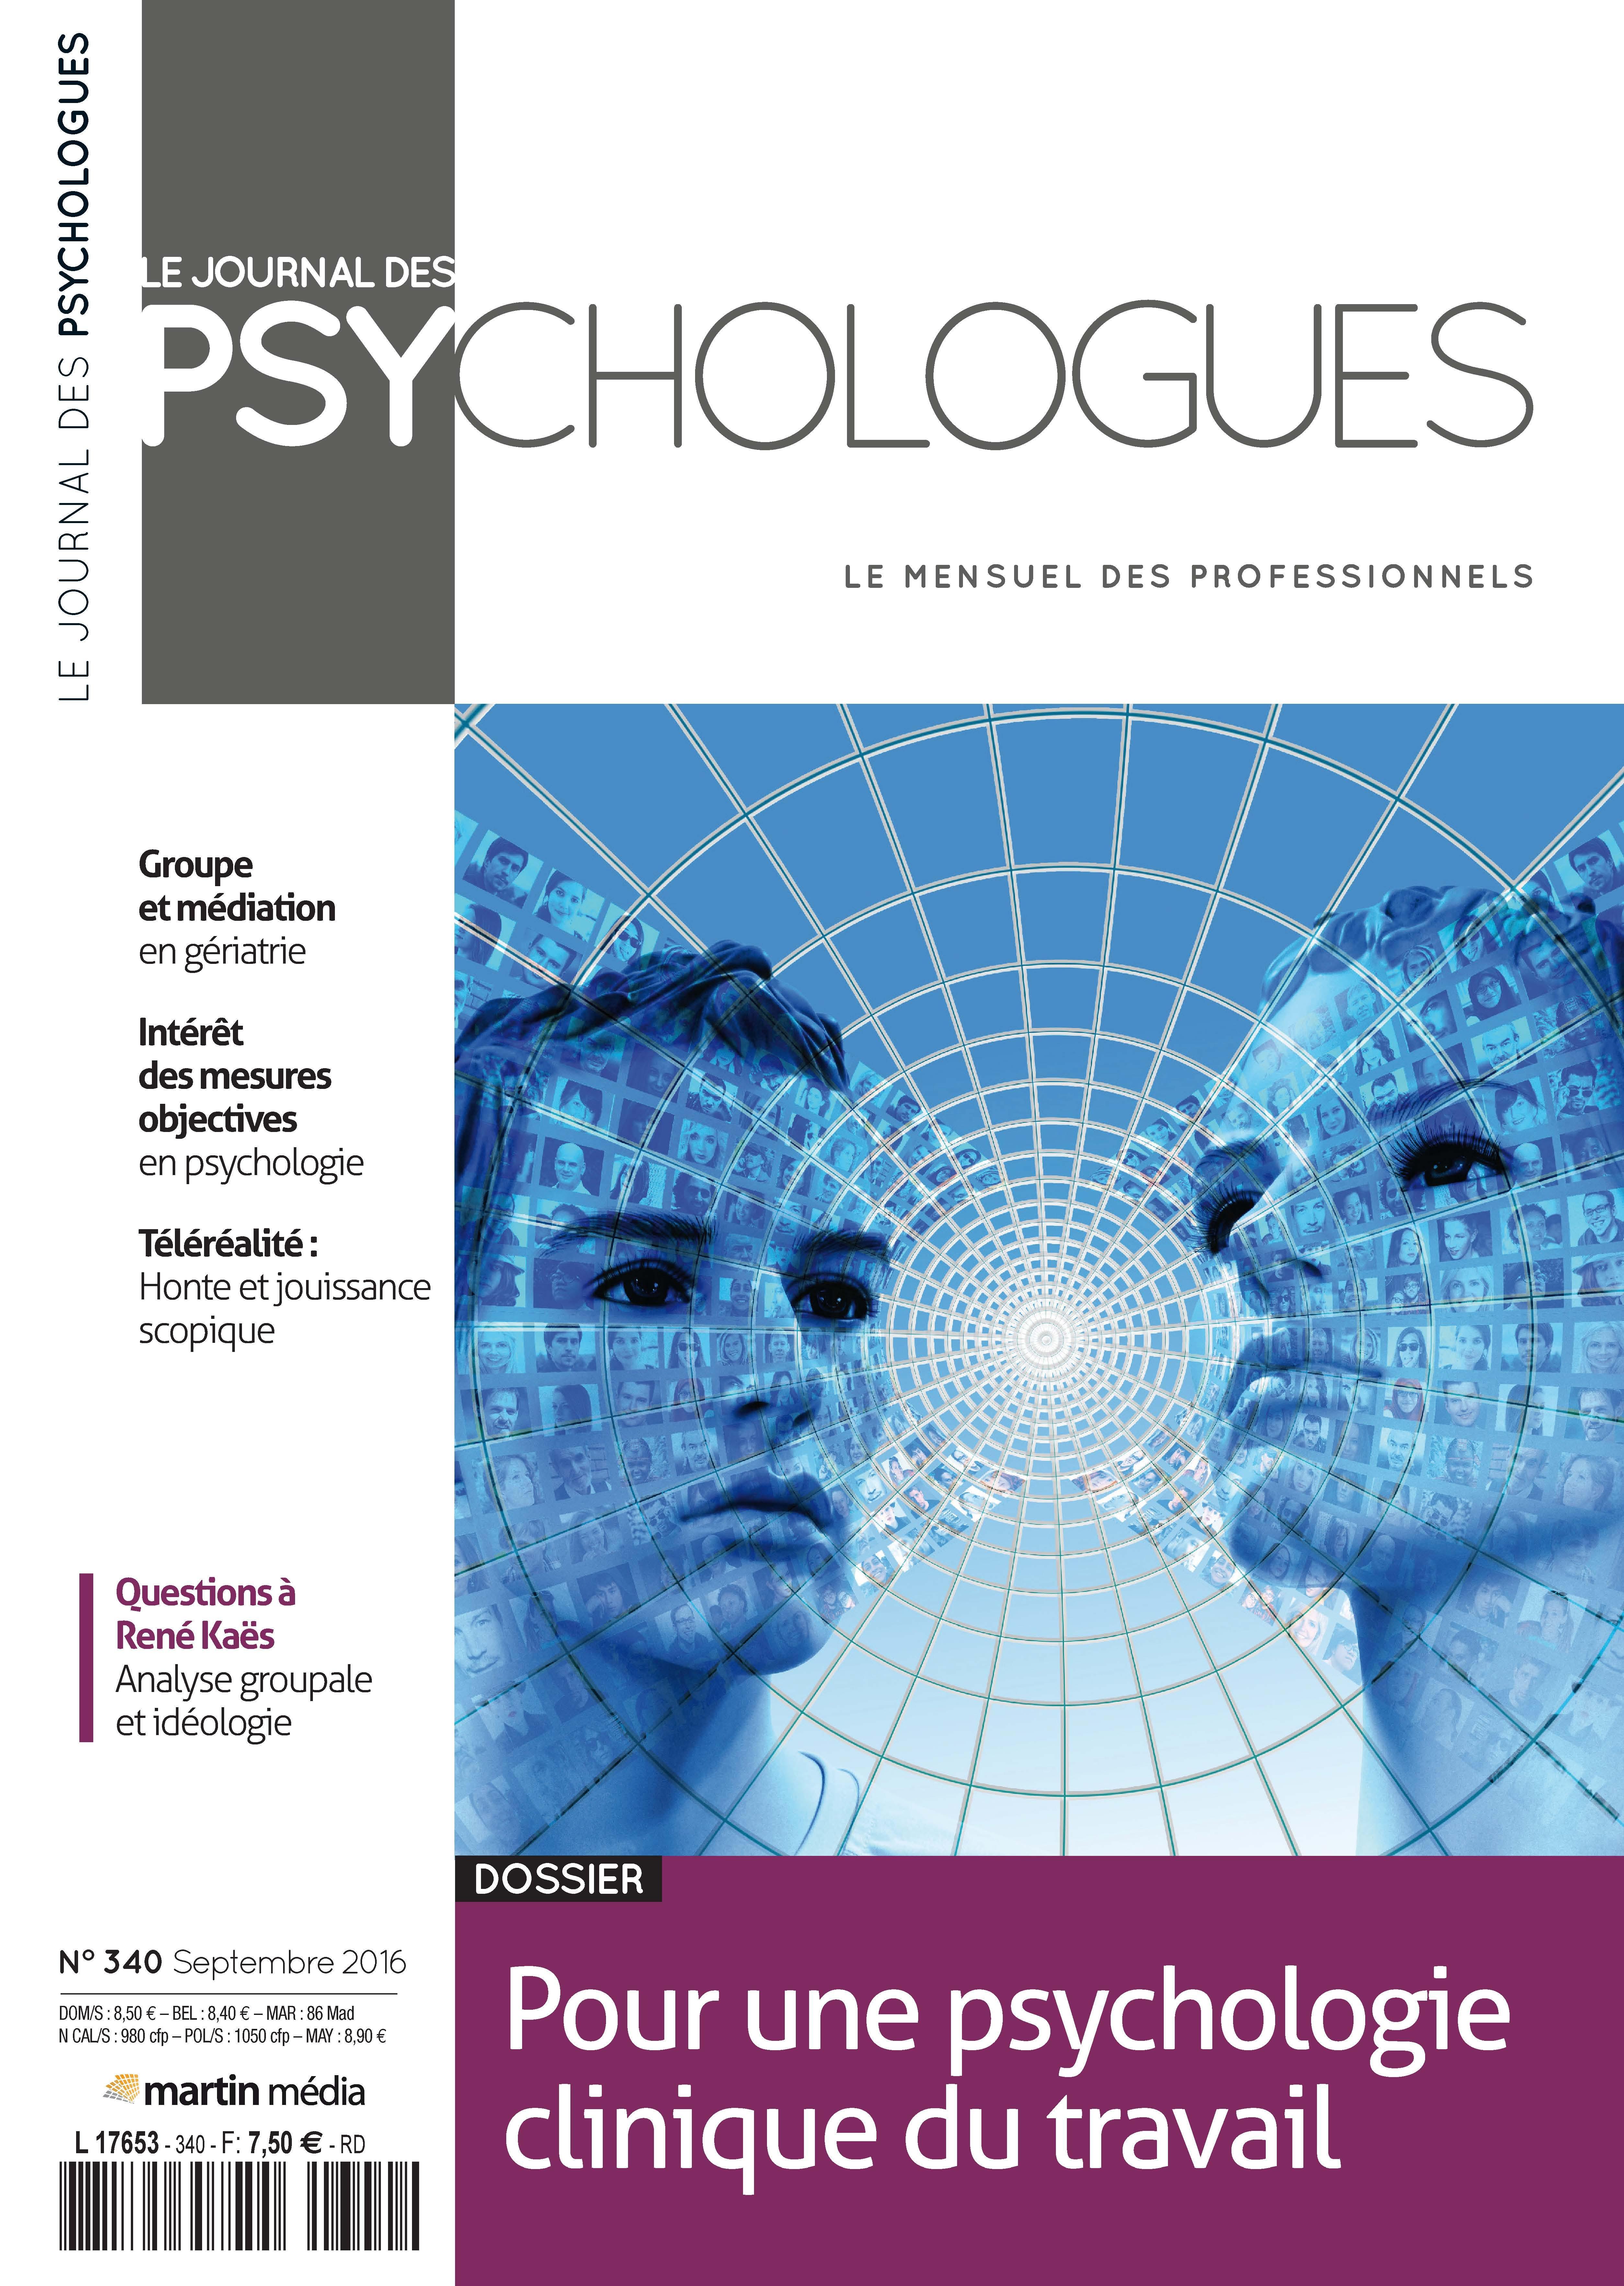 En Intérêt info Mesures PsychologieCairn Des Objectives BexCdro